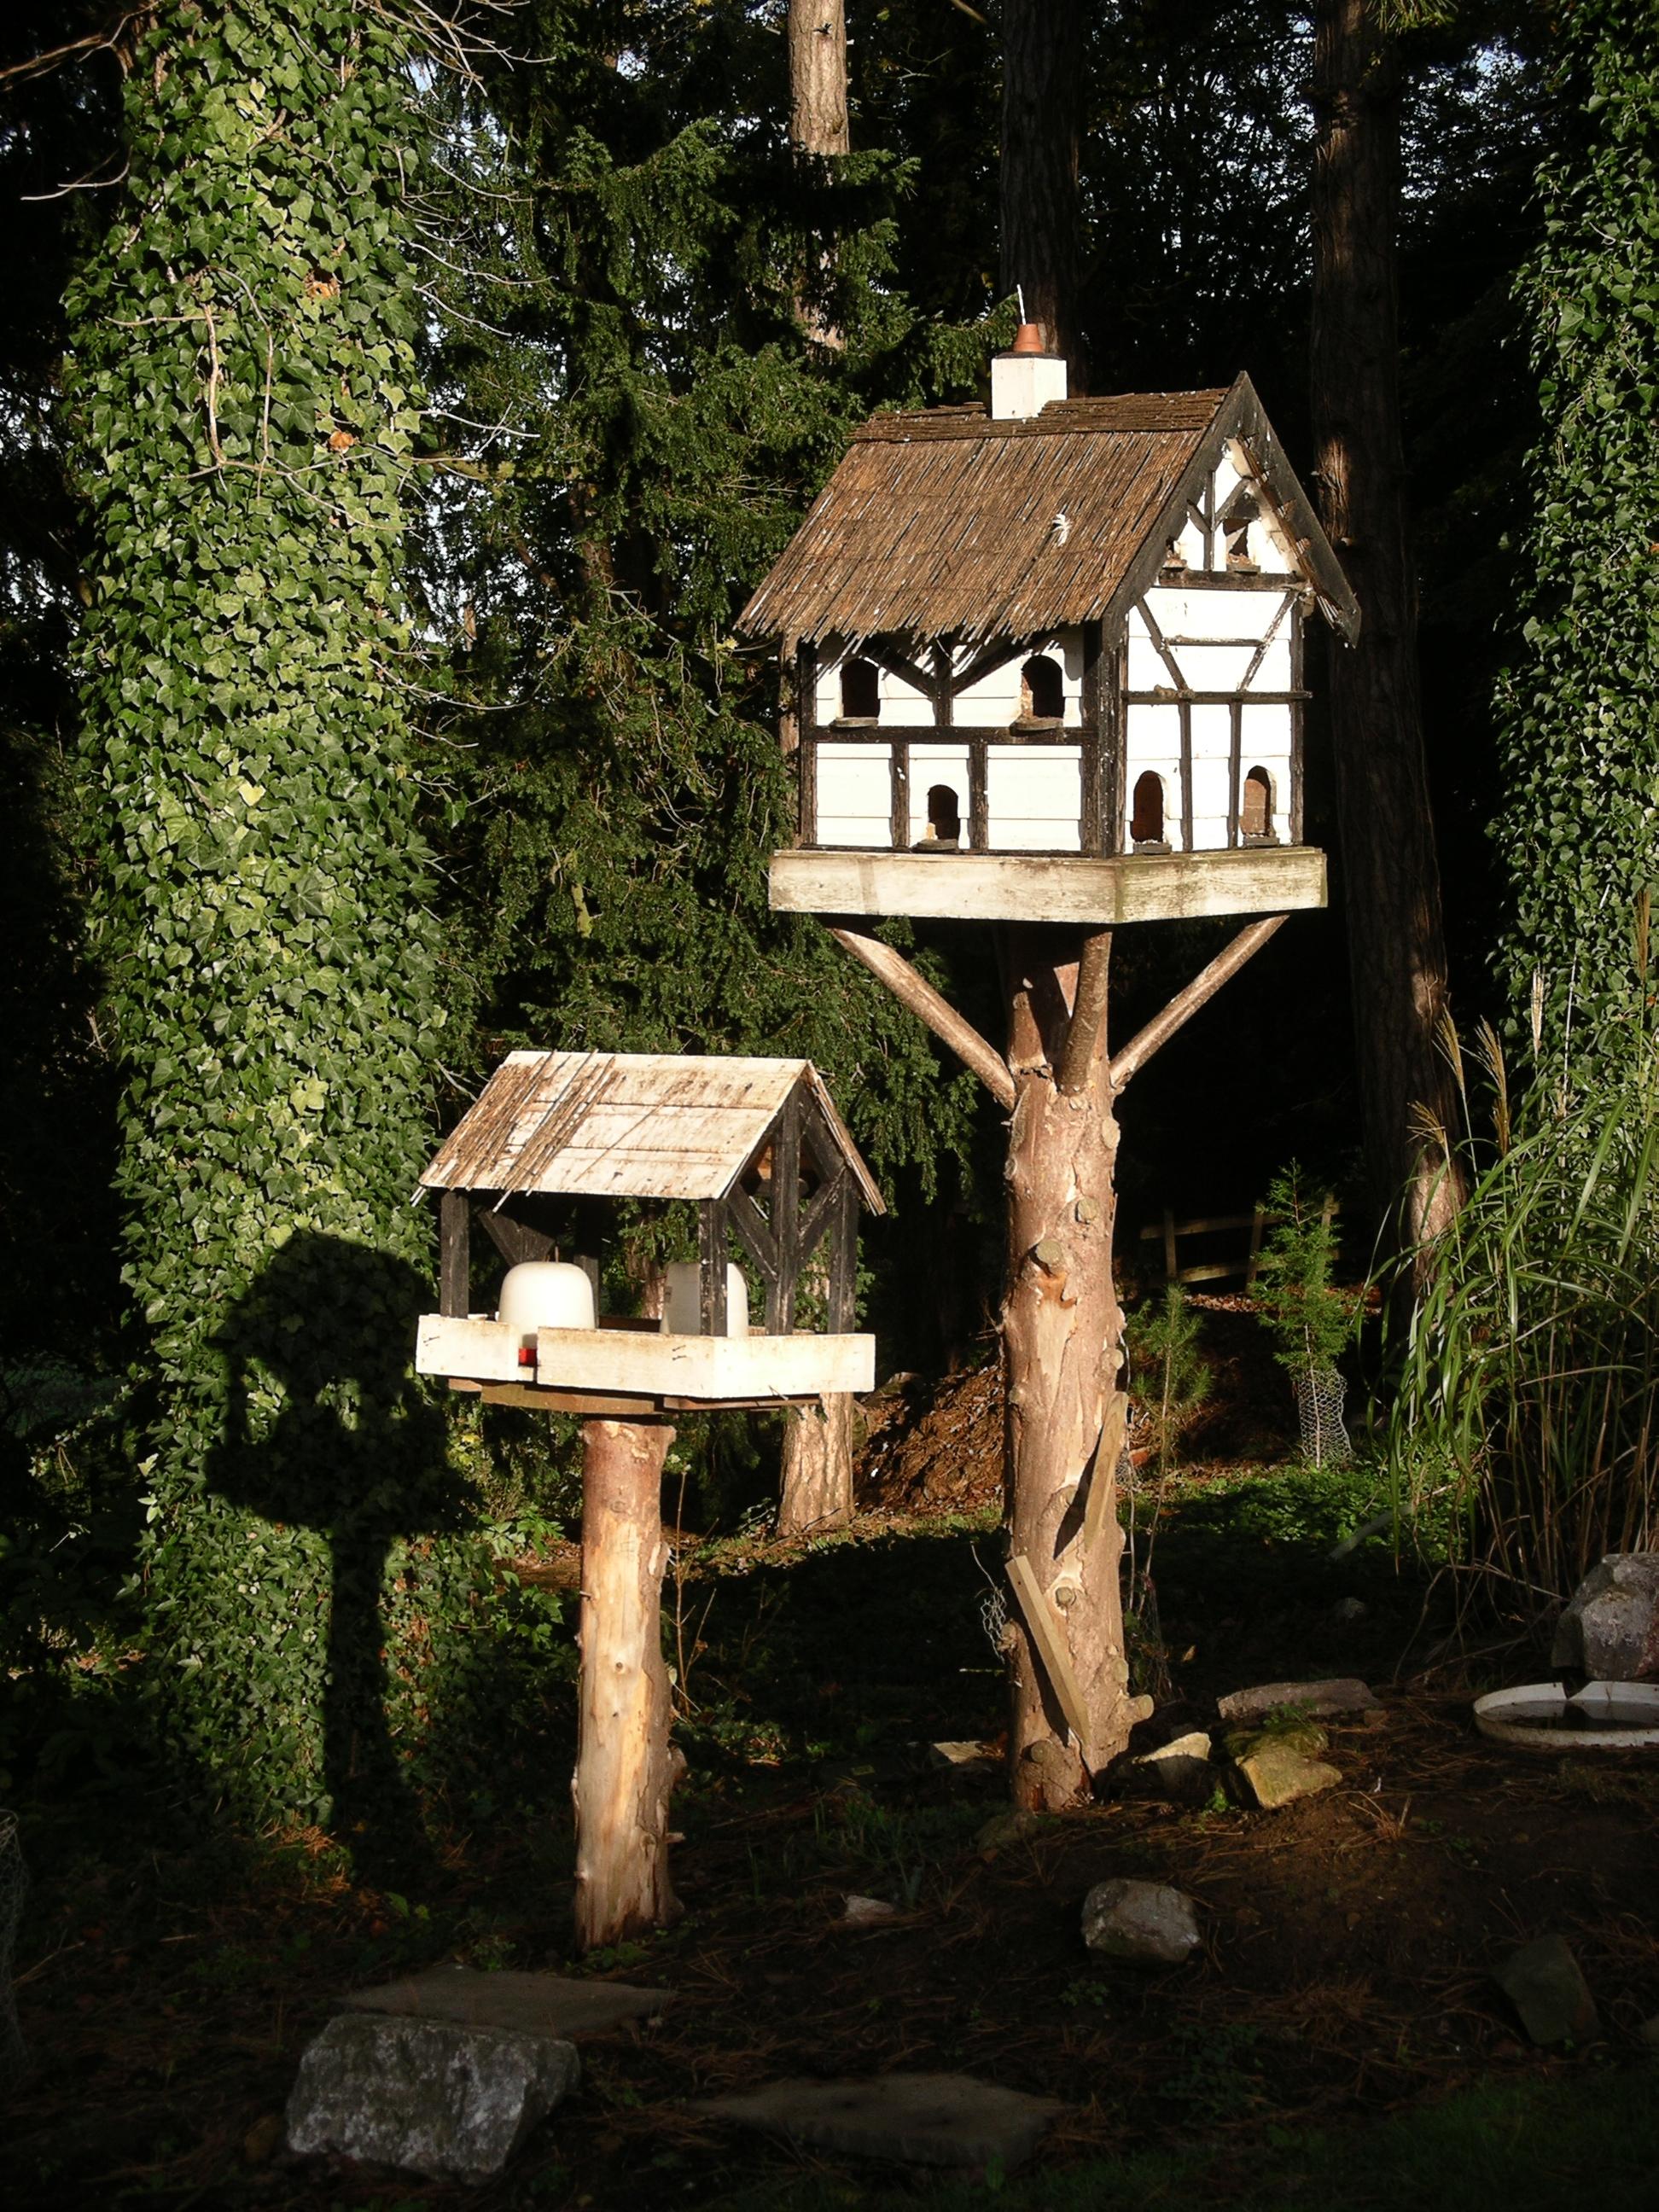 http://upload.wikimedia.org/wikipedia/commons/6/66/Bird_box%40Bird_feeding_station%40Tortworth_Court.JPG?uselang=fr